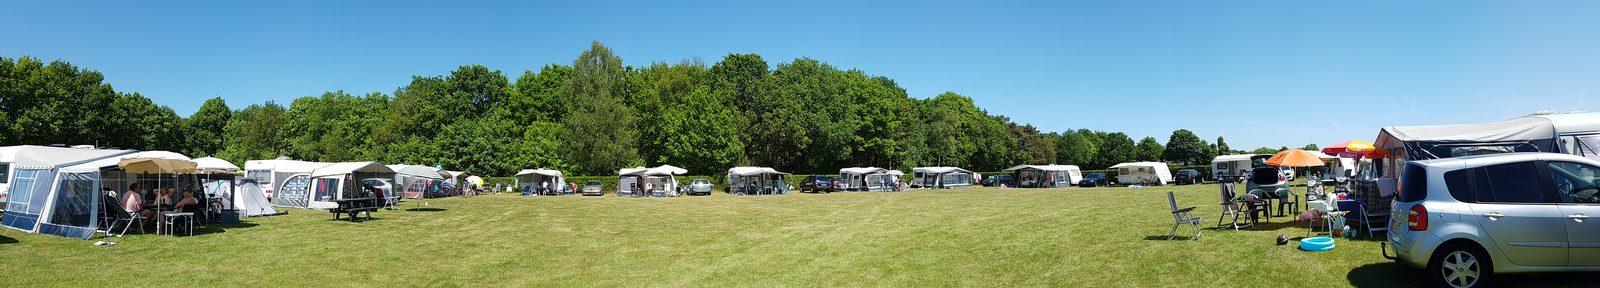 Camping Loon op Zand